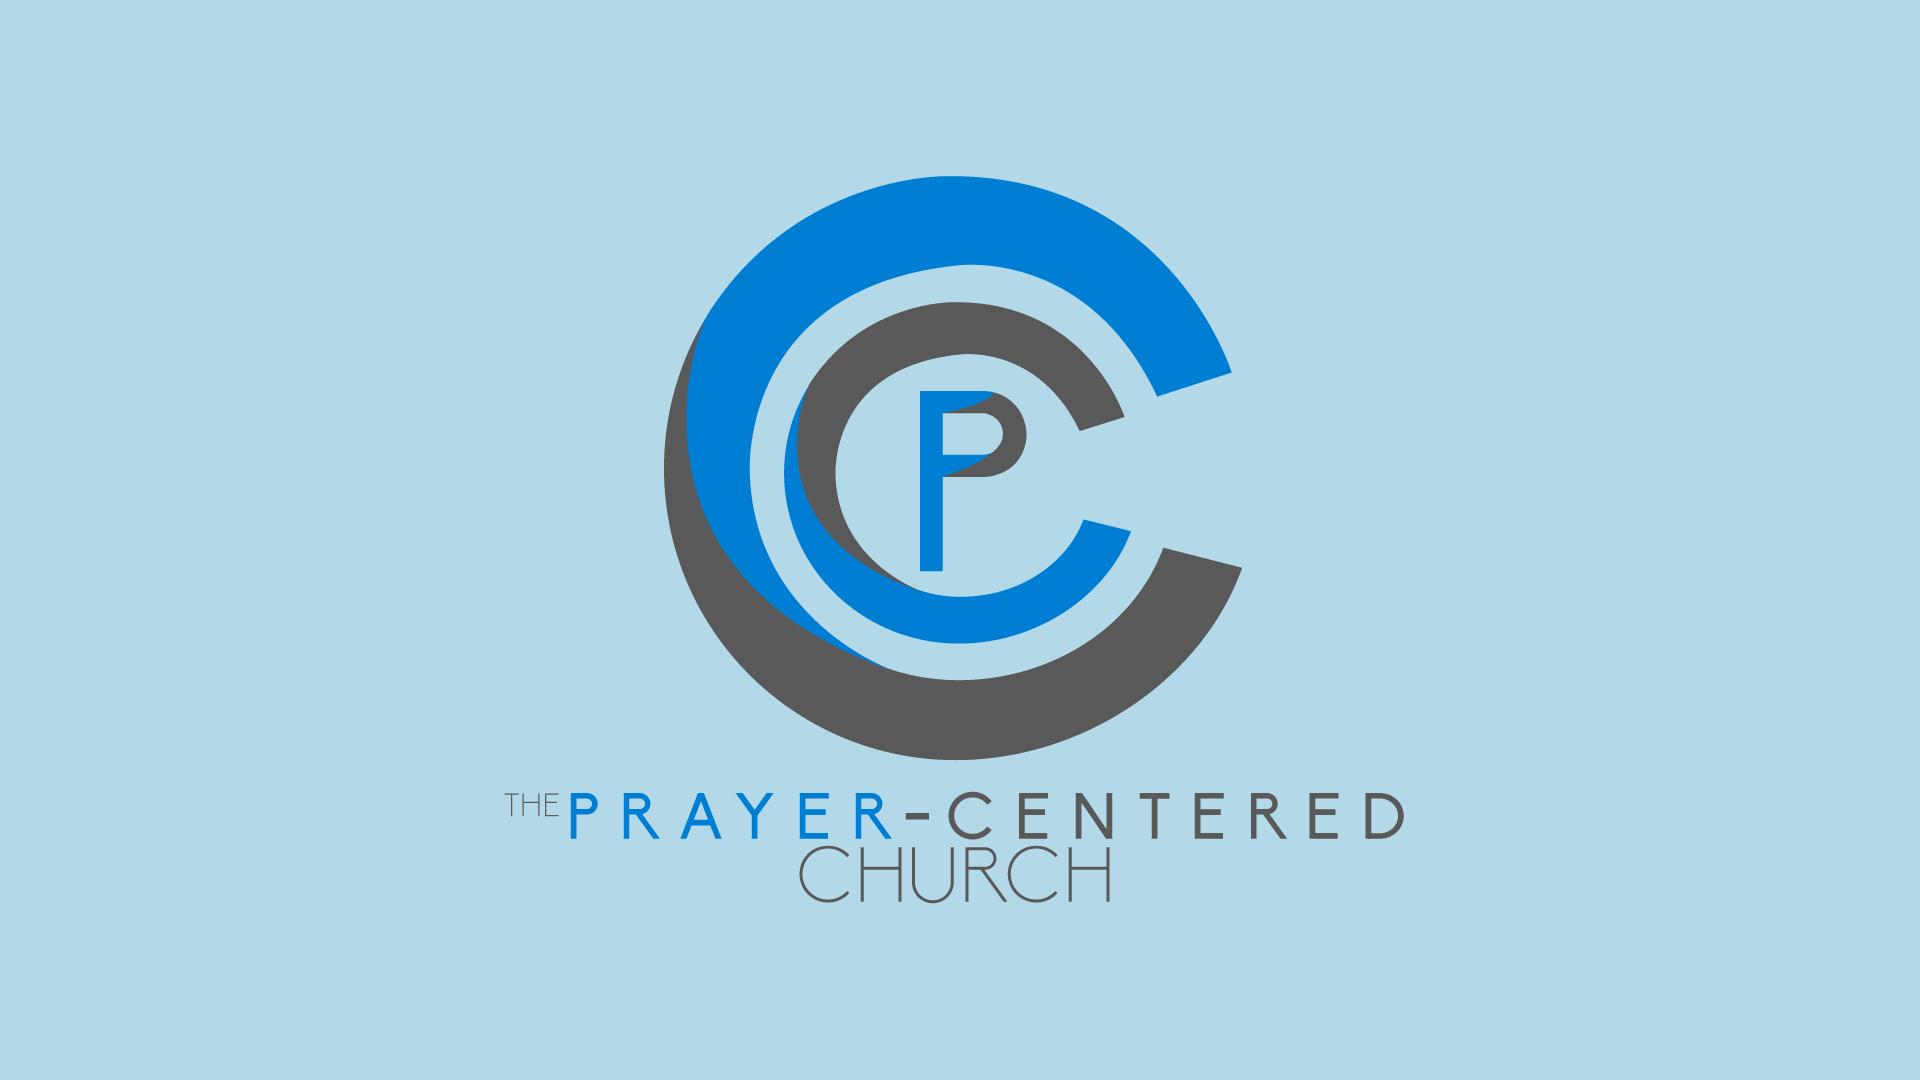 Prayer Centered Church Graphic Design